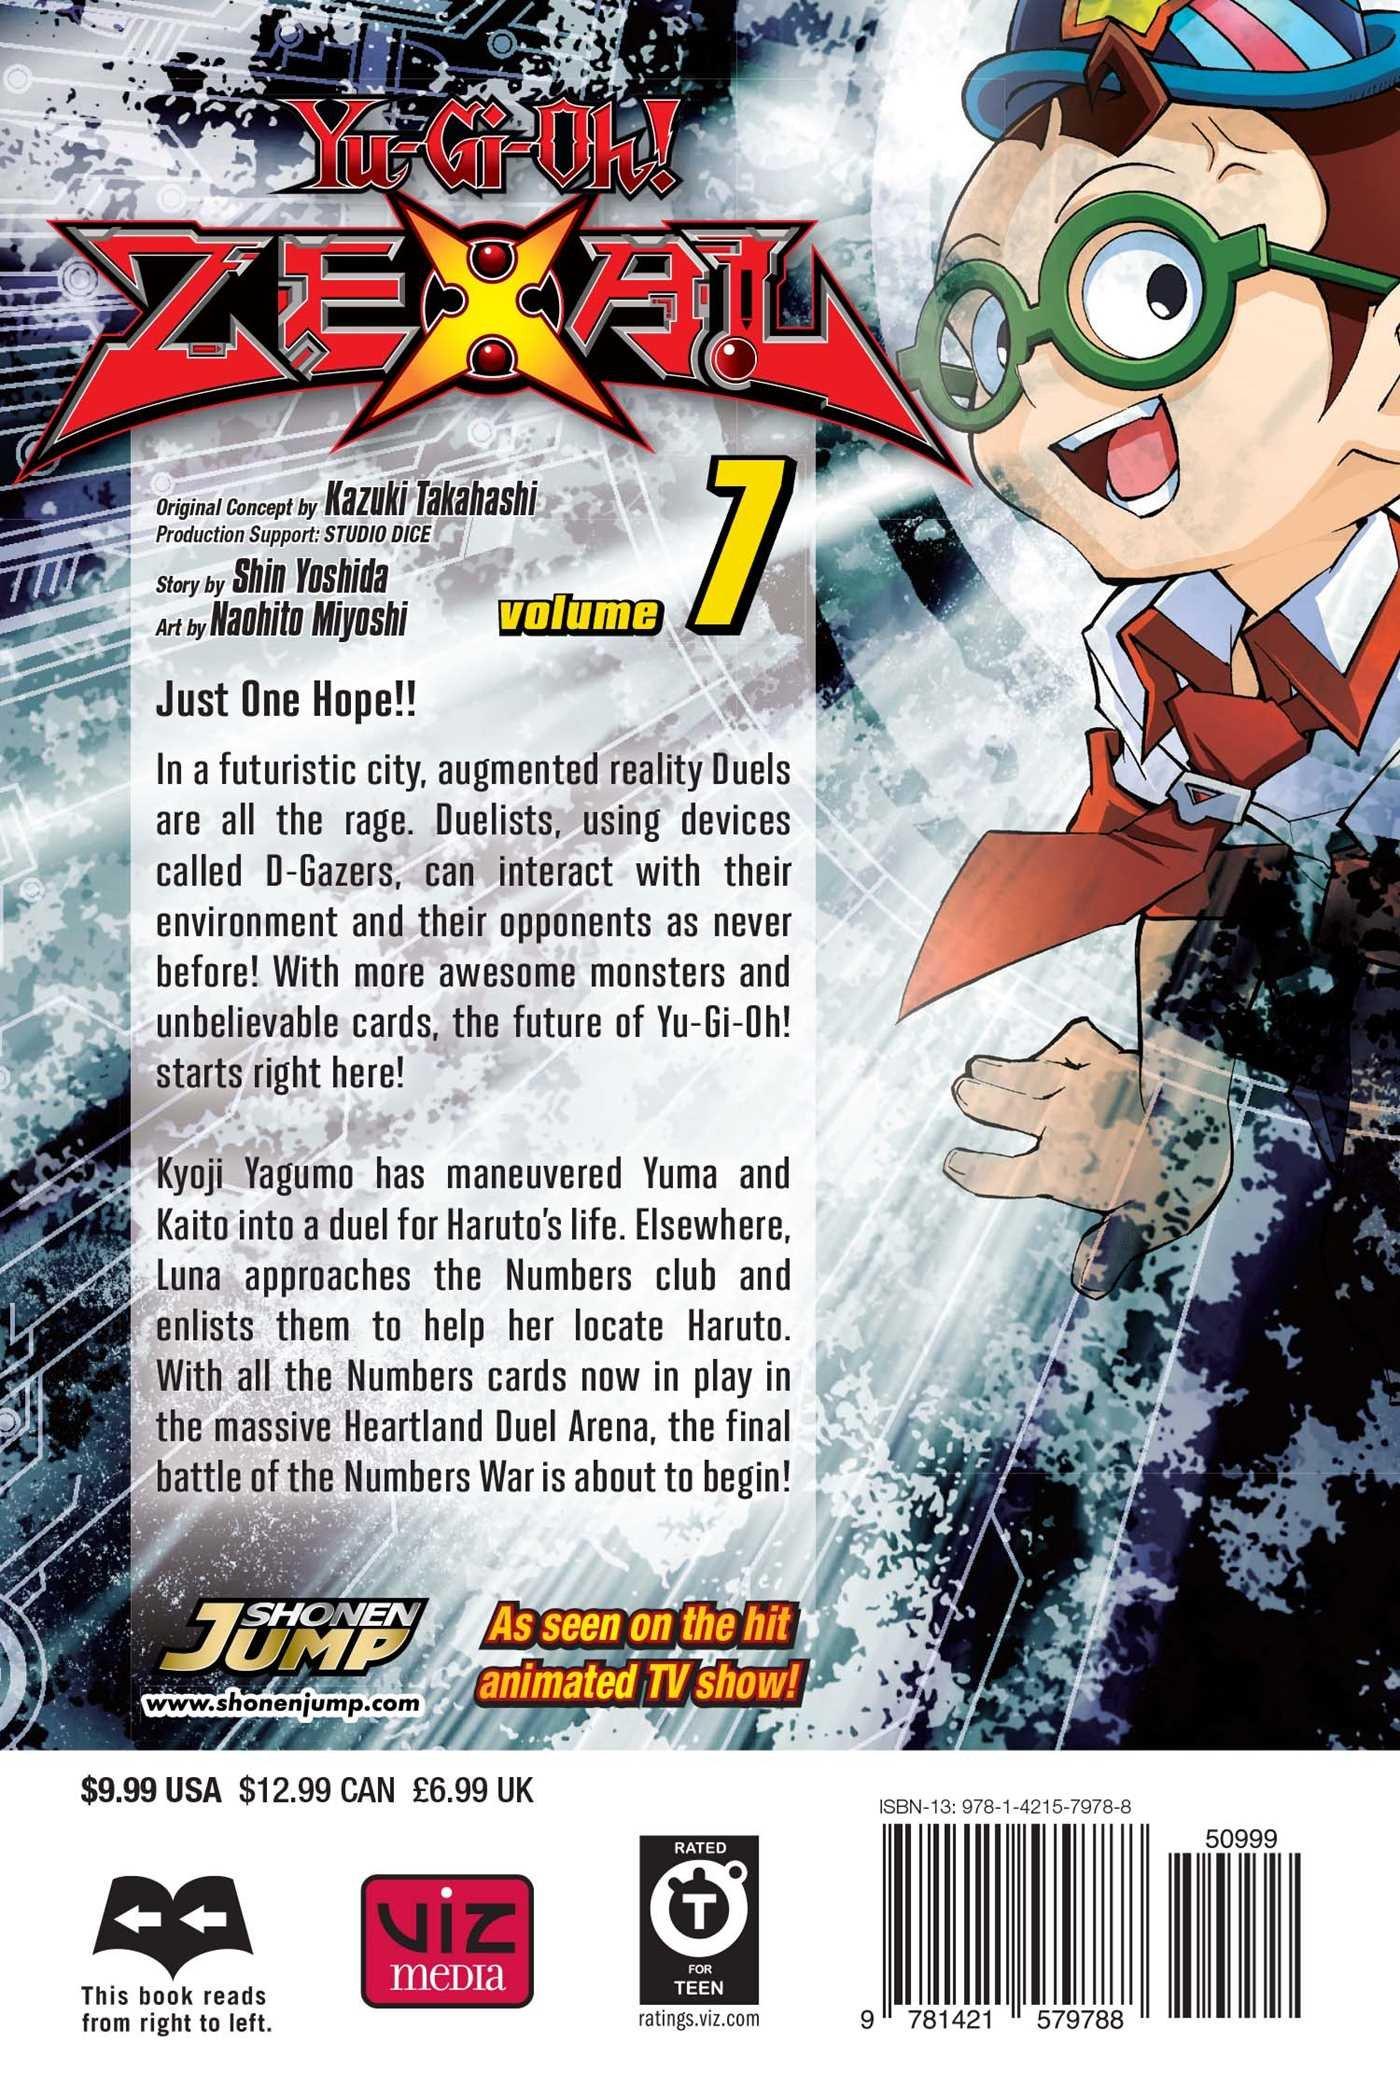 yu-gi-oh! zexal, anime, manga, cards, reviews, Flip Turner, Tokunosuke Omoteura